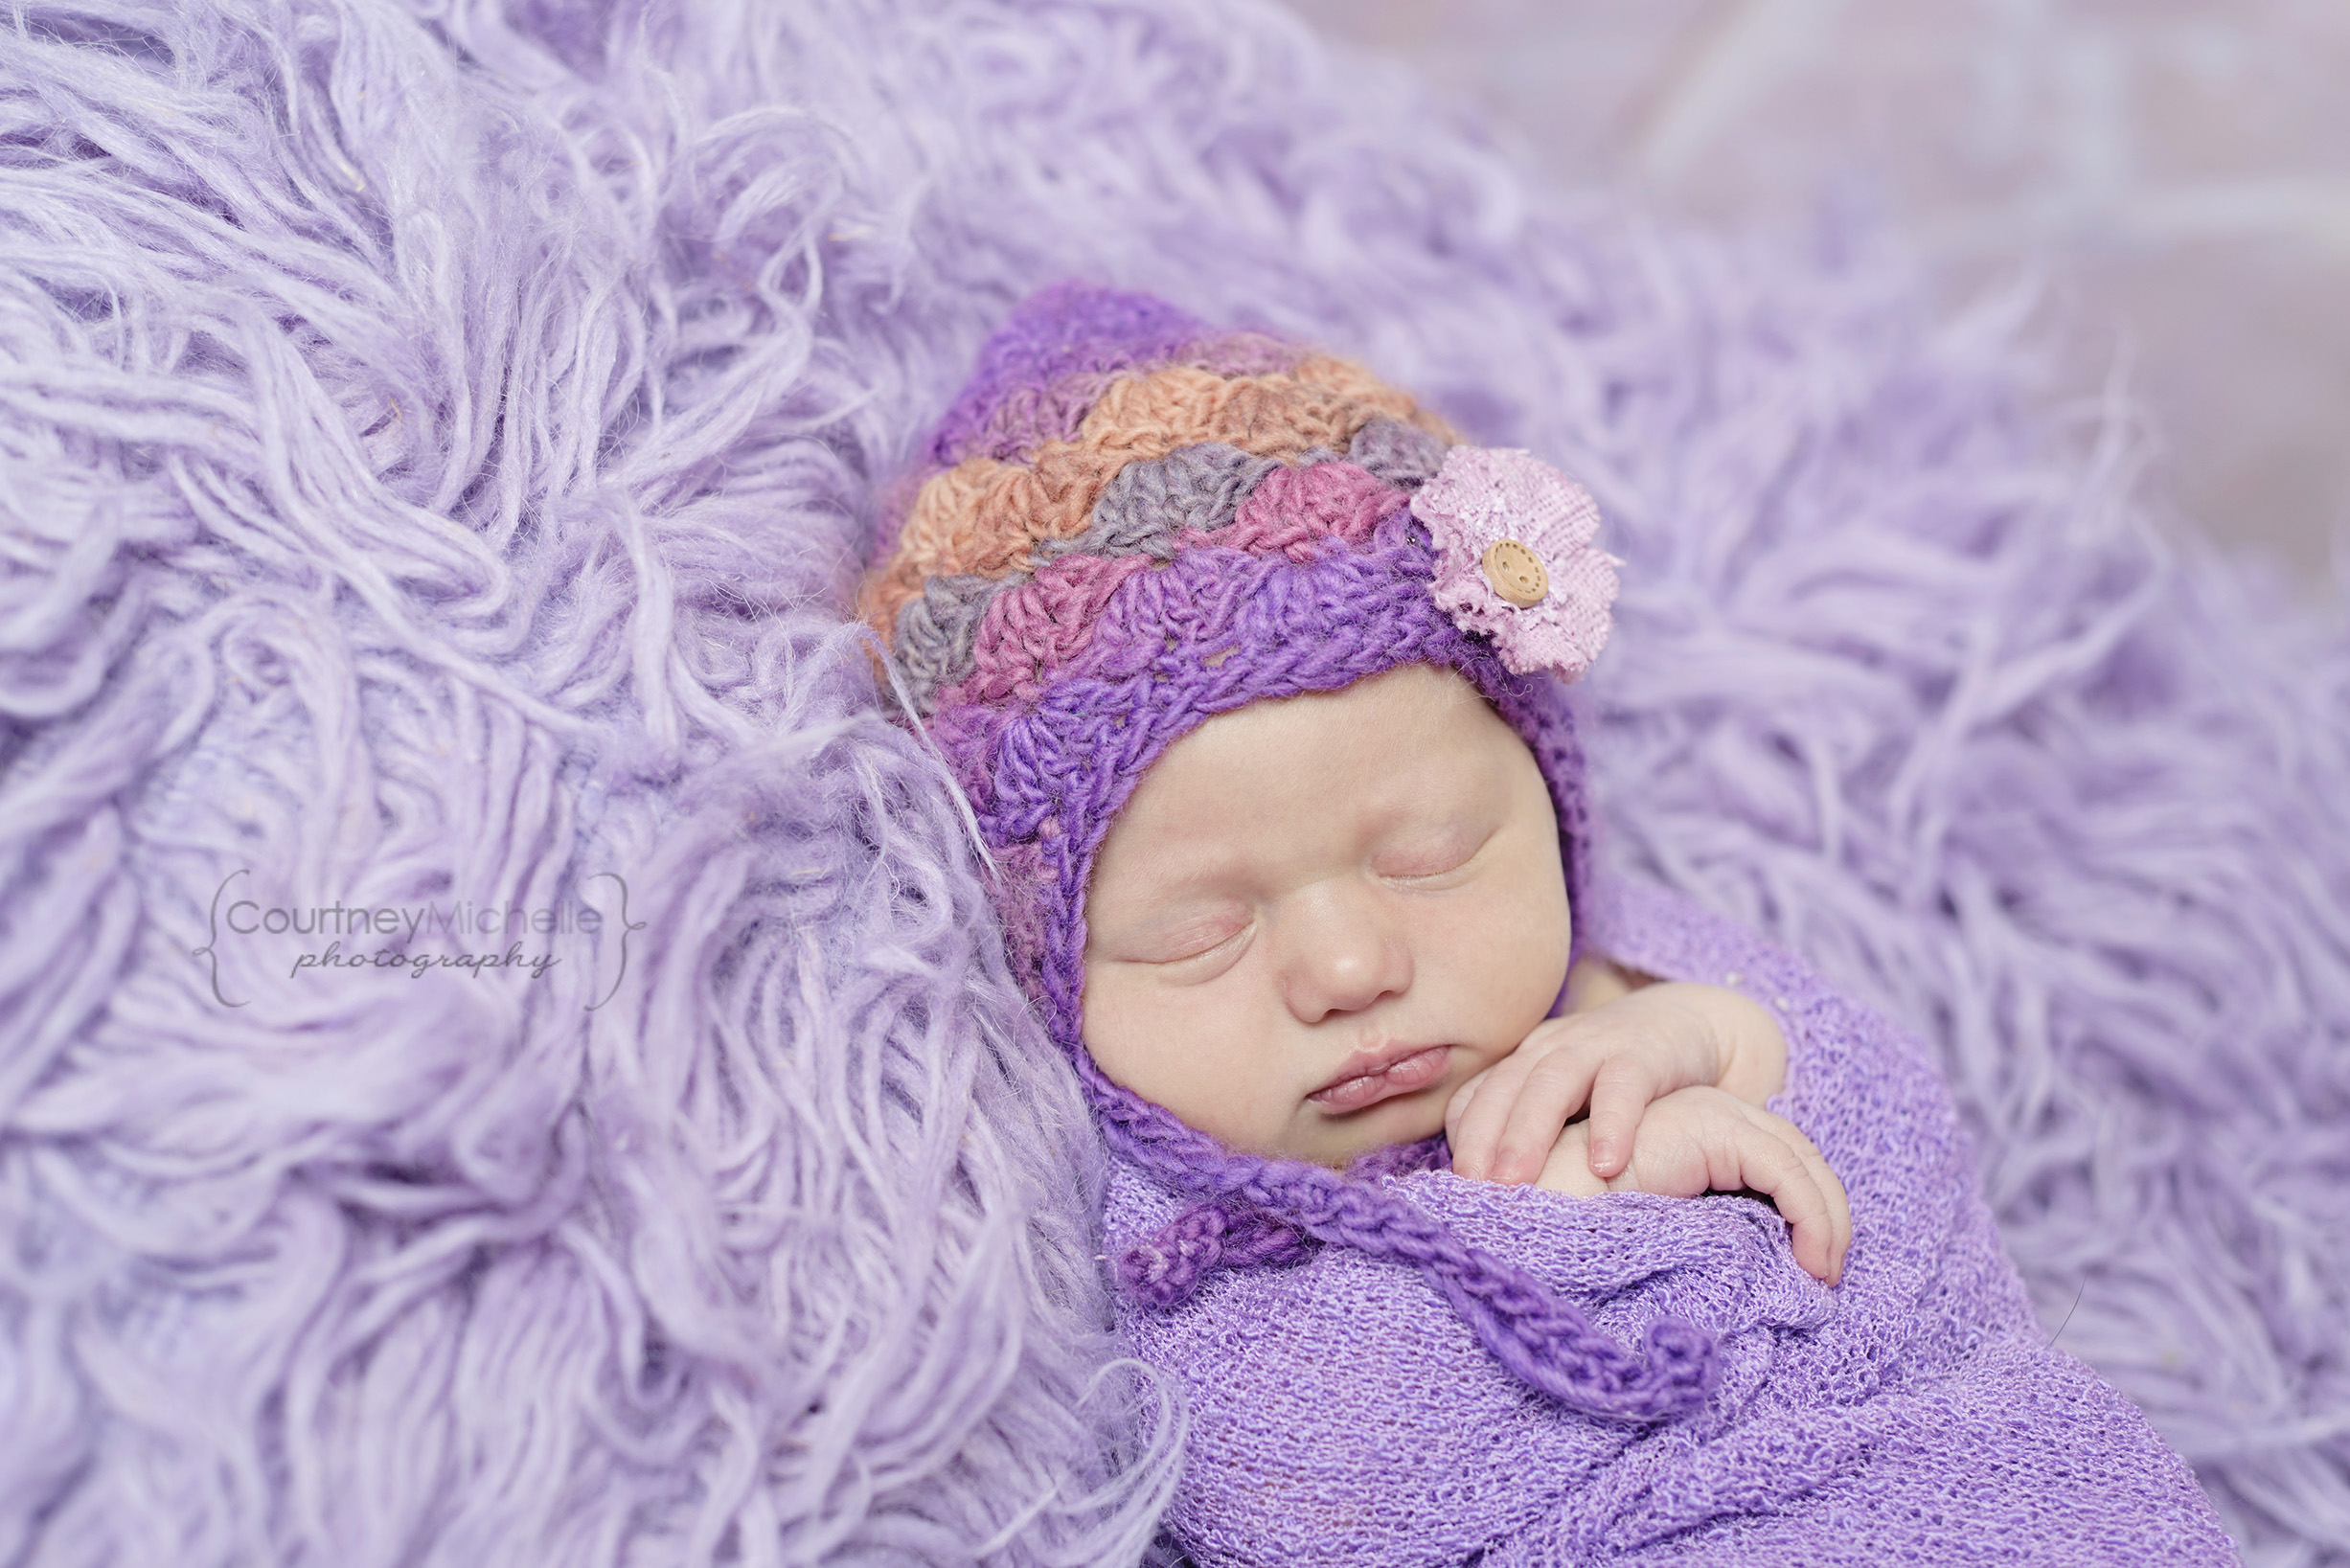 chicago-newborn-photographer©COPYRIGHTCMP-5190edit.jpg